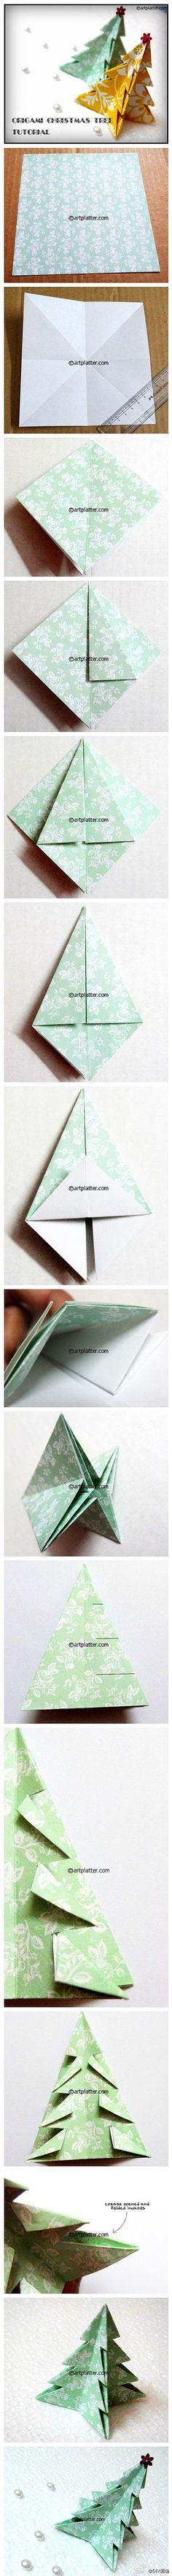 Origami Arvore de natal